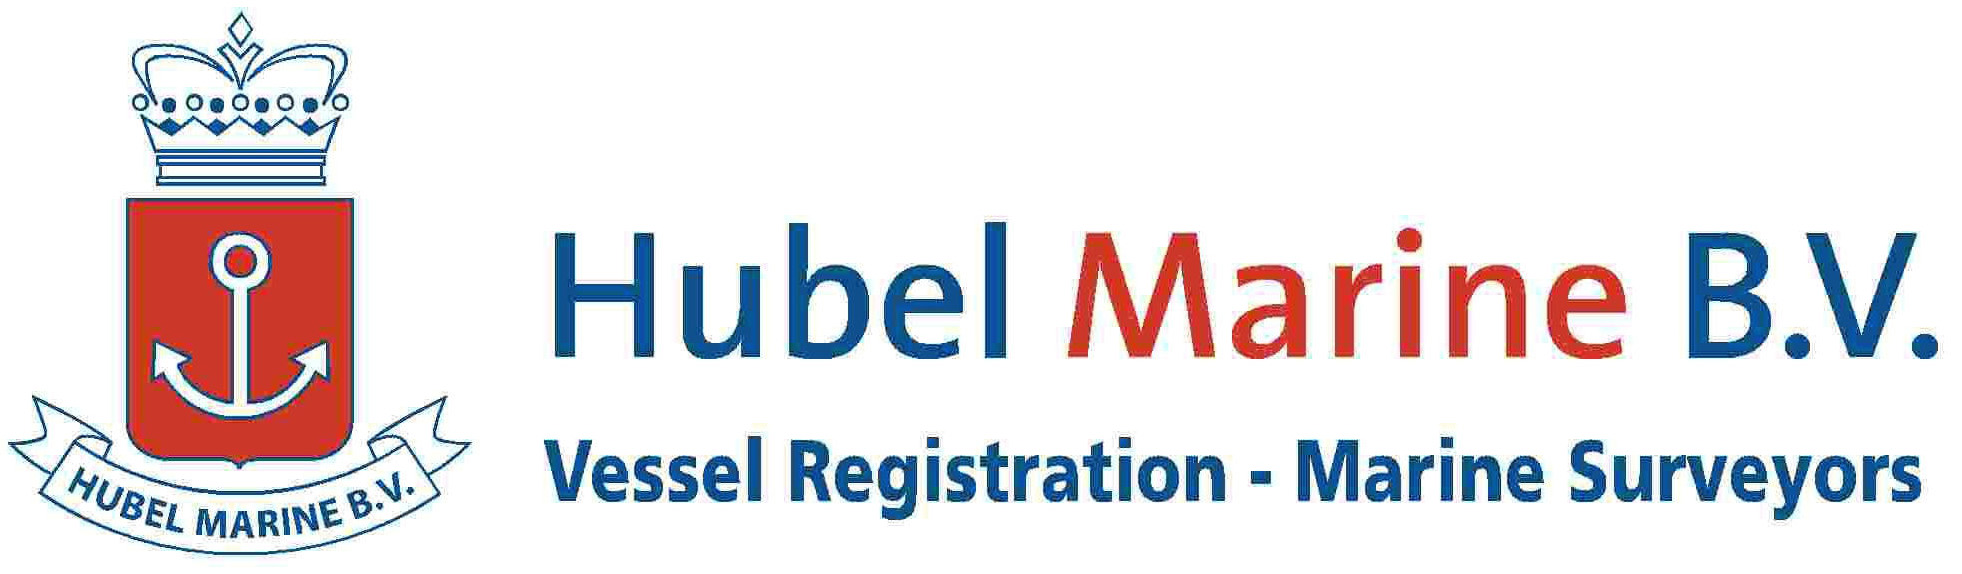 V Marine Fuels B.v Hubel Marine B.V. - Be...